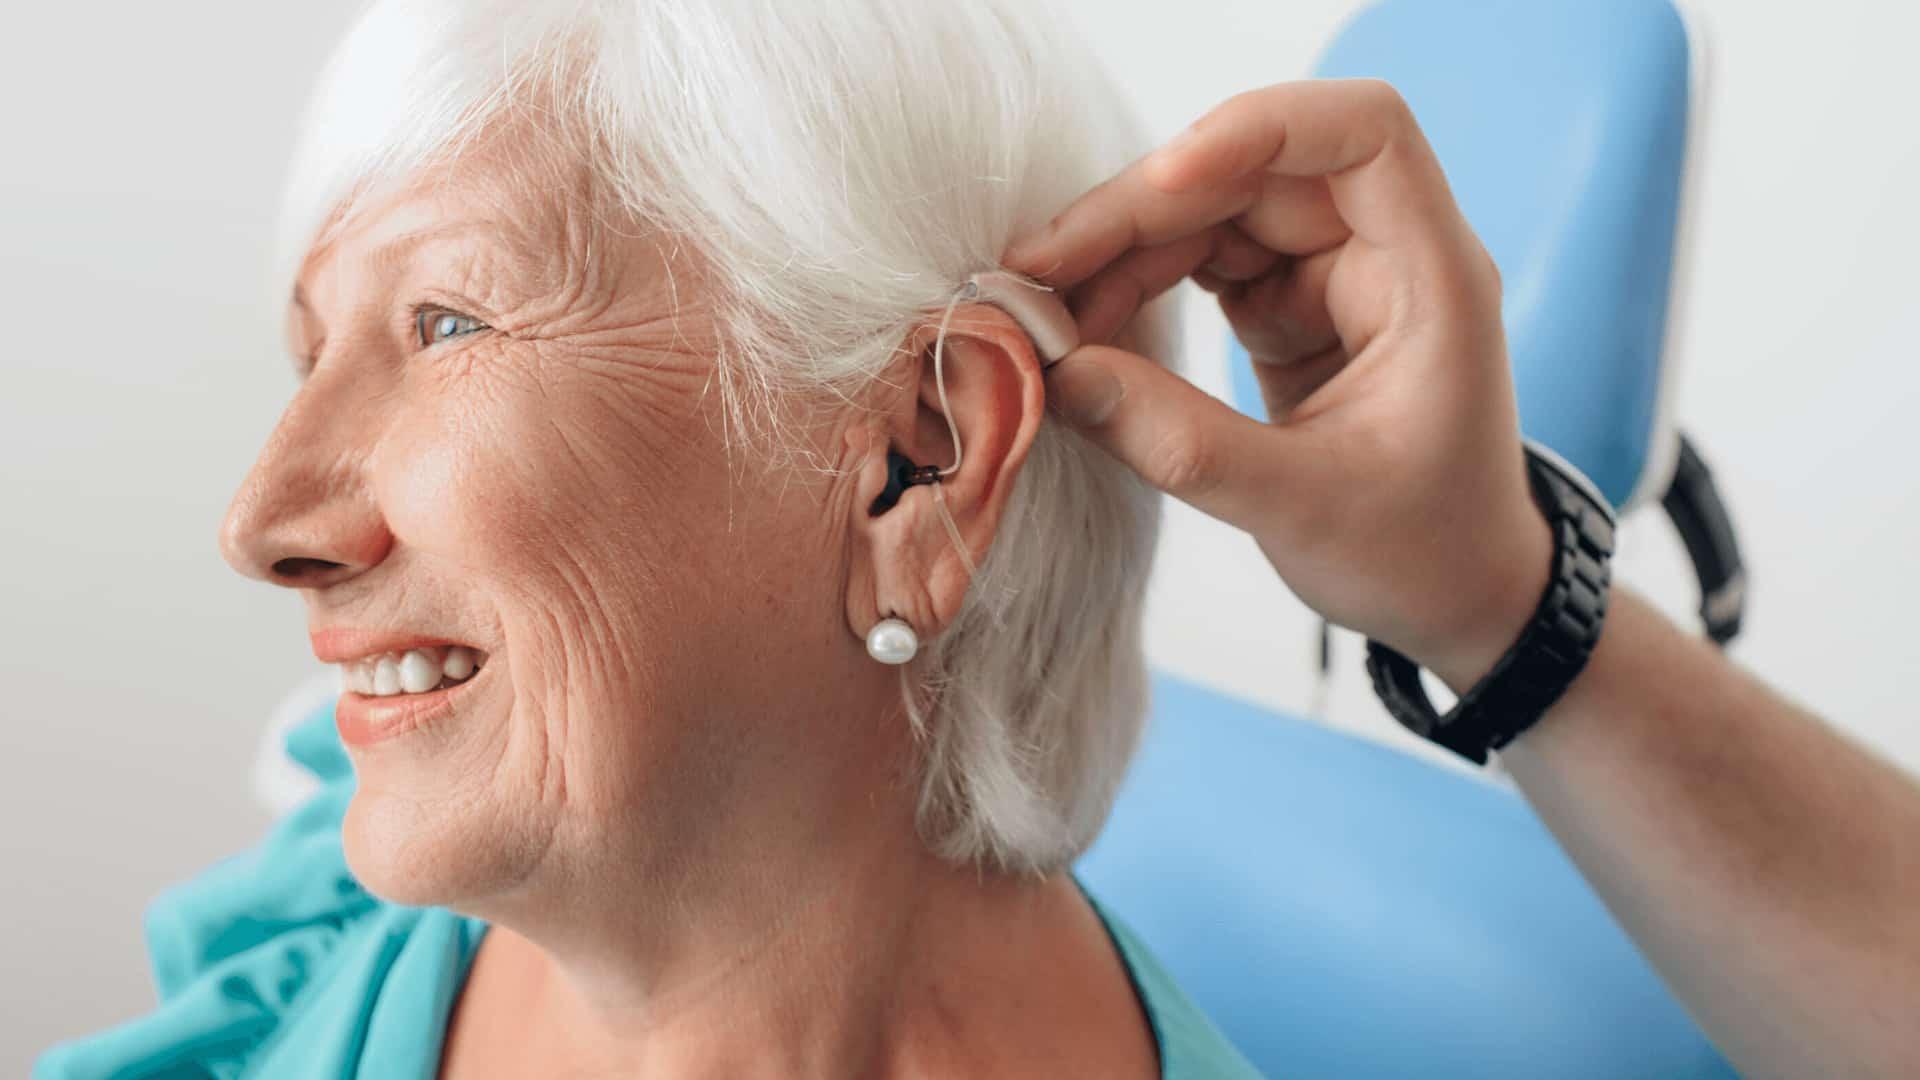 Colocando audífono mujer mayor